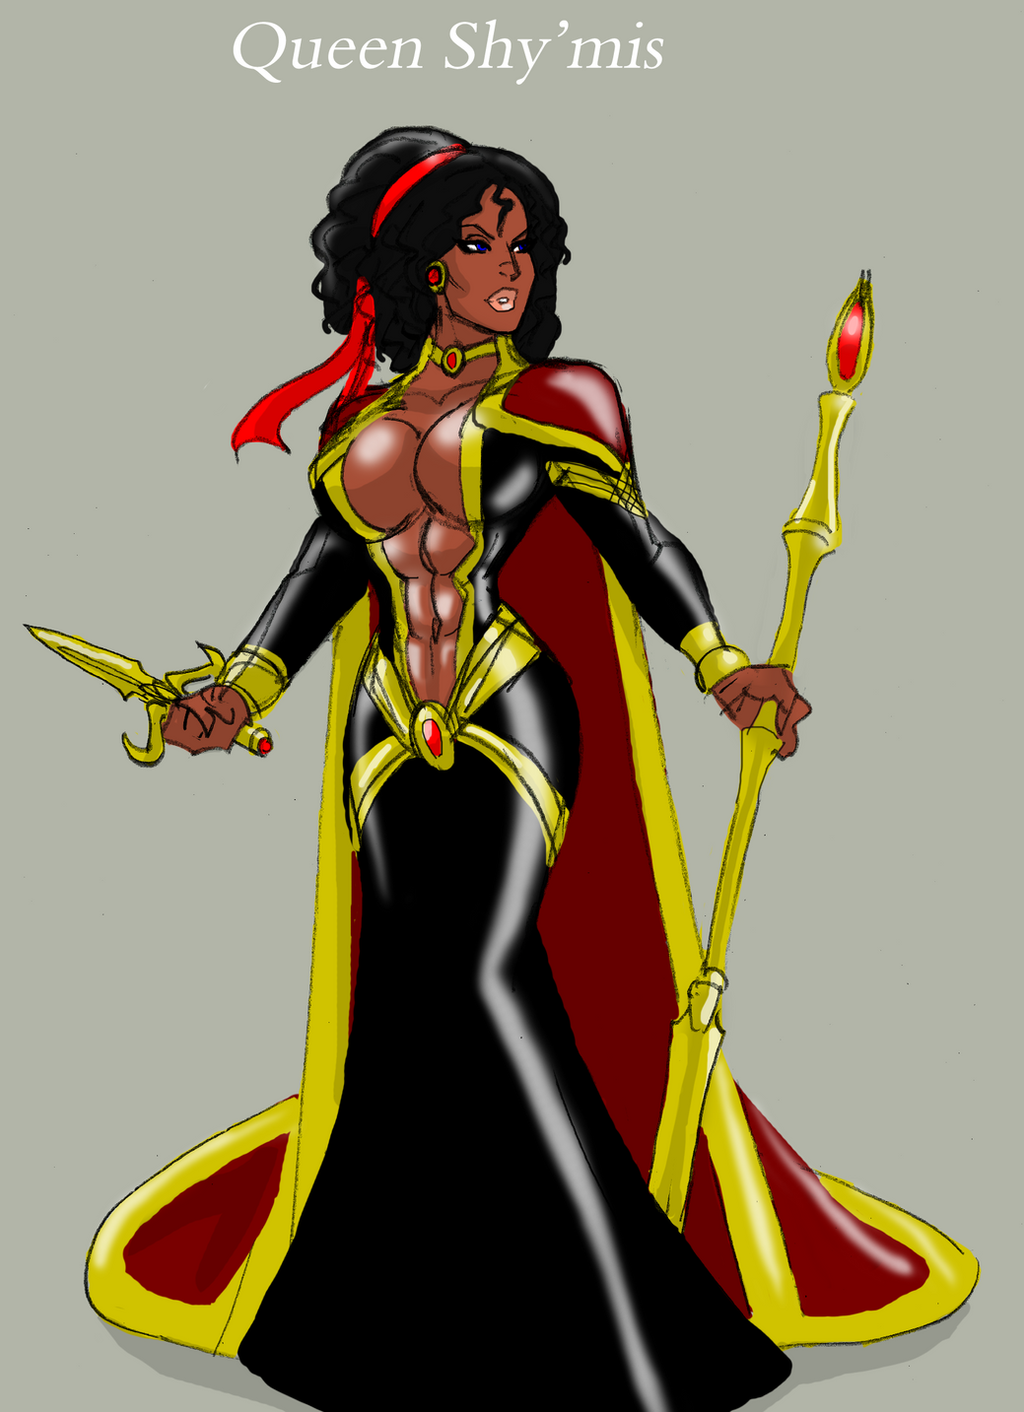 Queen Shymis by johnnyharadrim